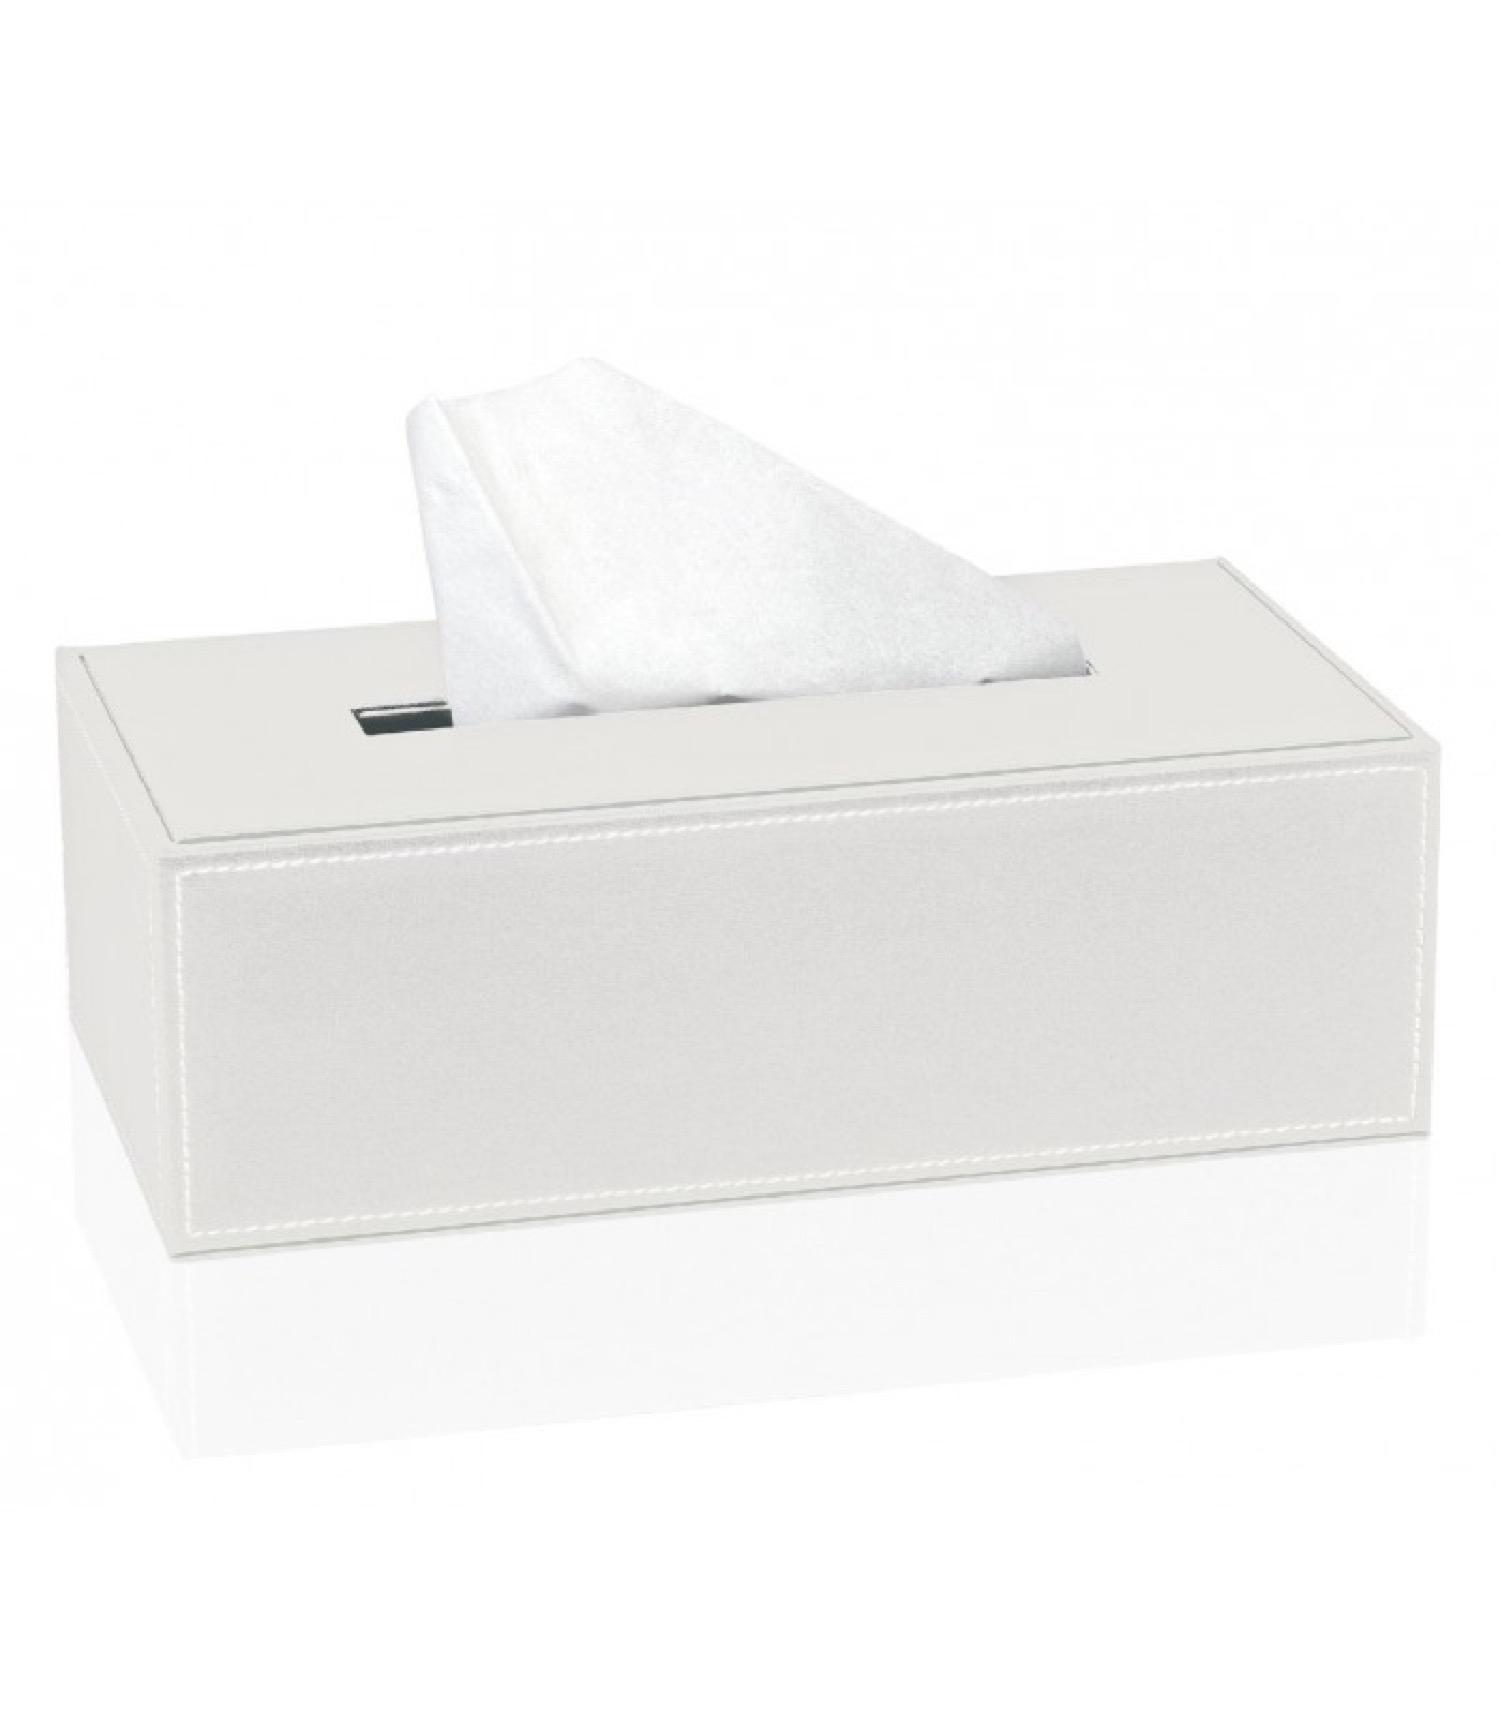 Boîte à mouchoirs similicuir blanc 26x14cm (photo)